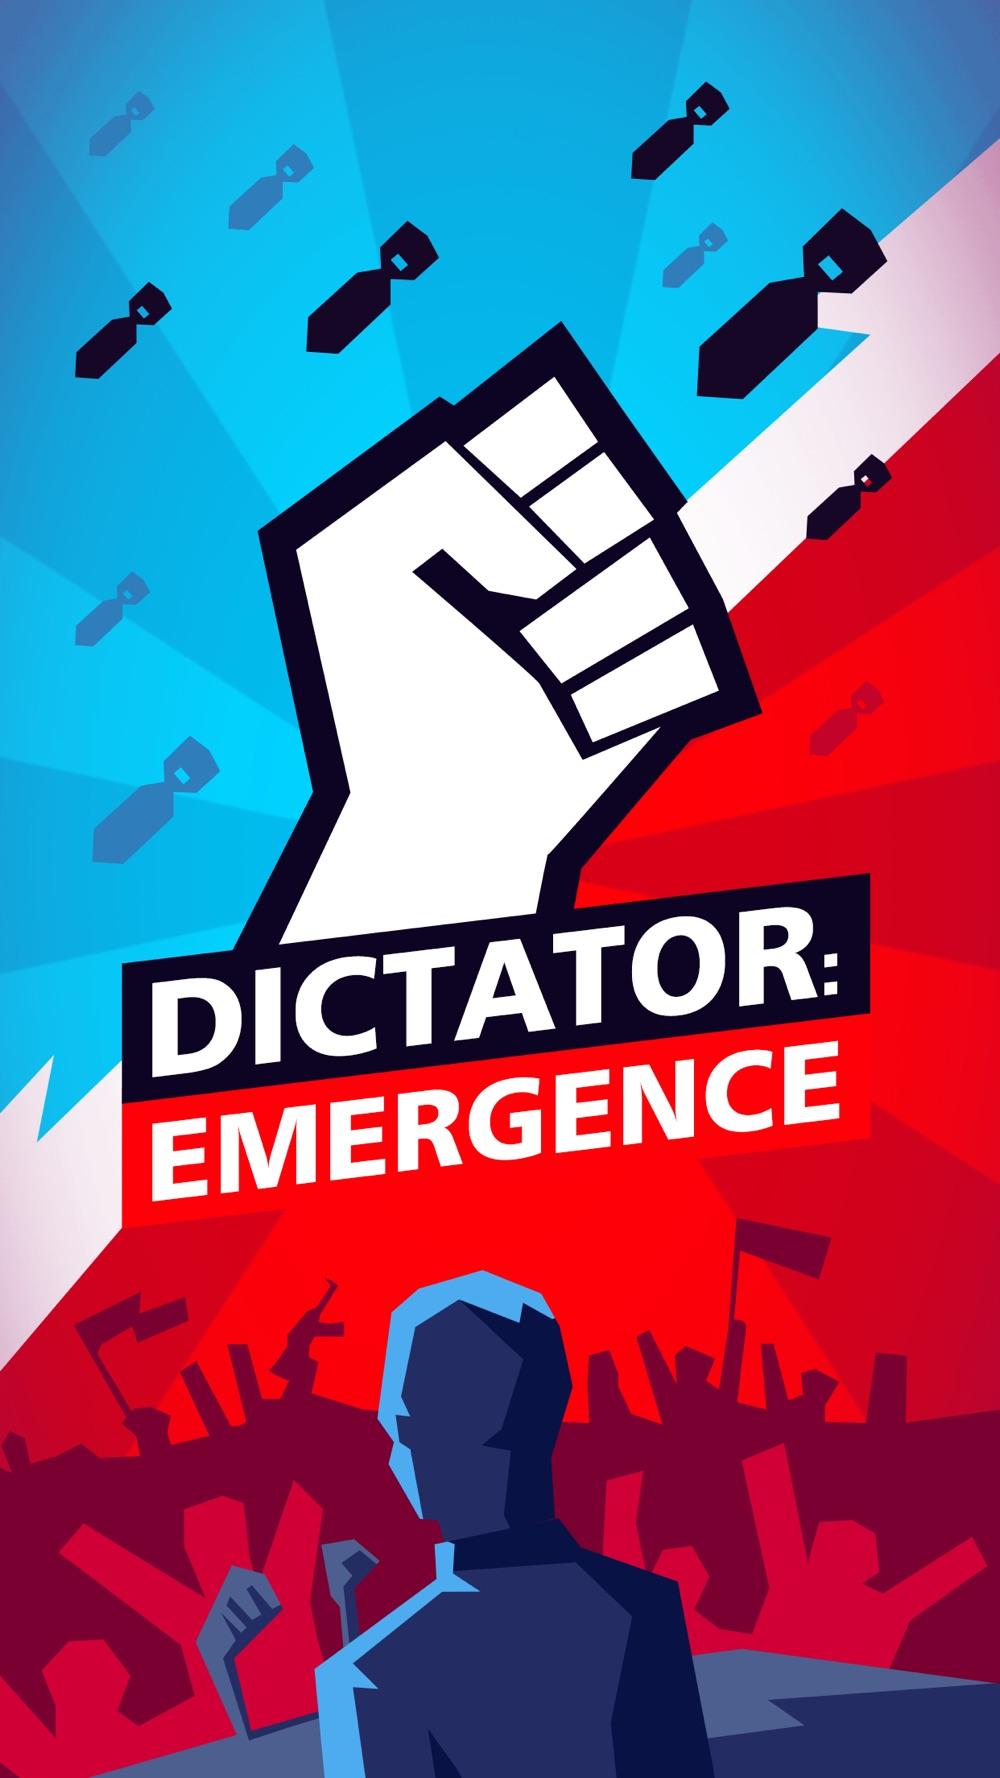 Dictator: Emergence Cheat Codes